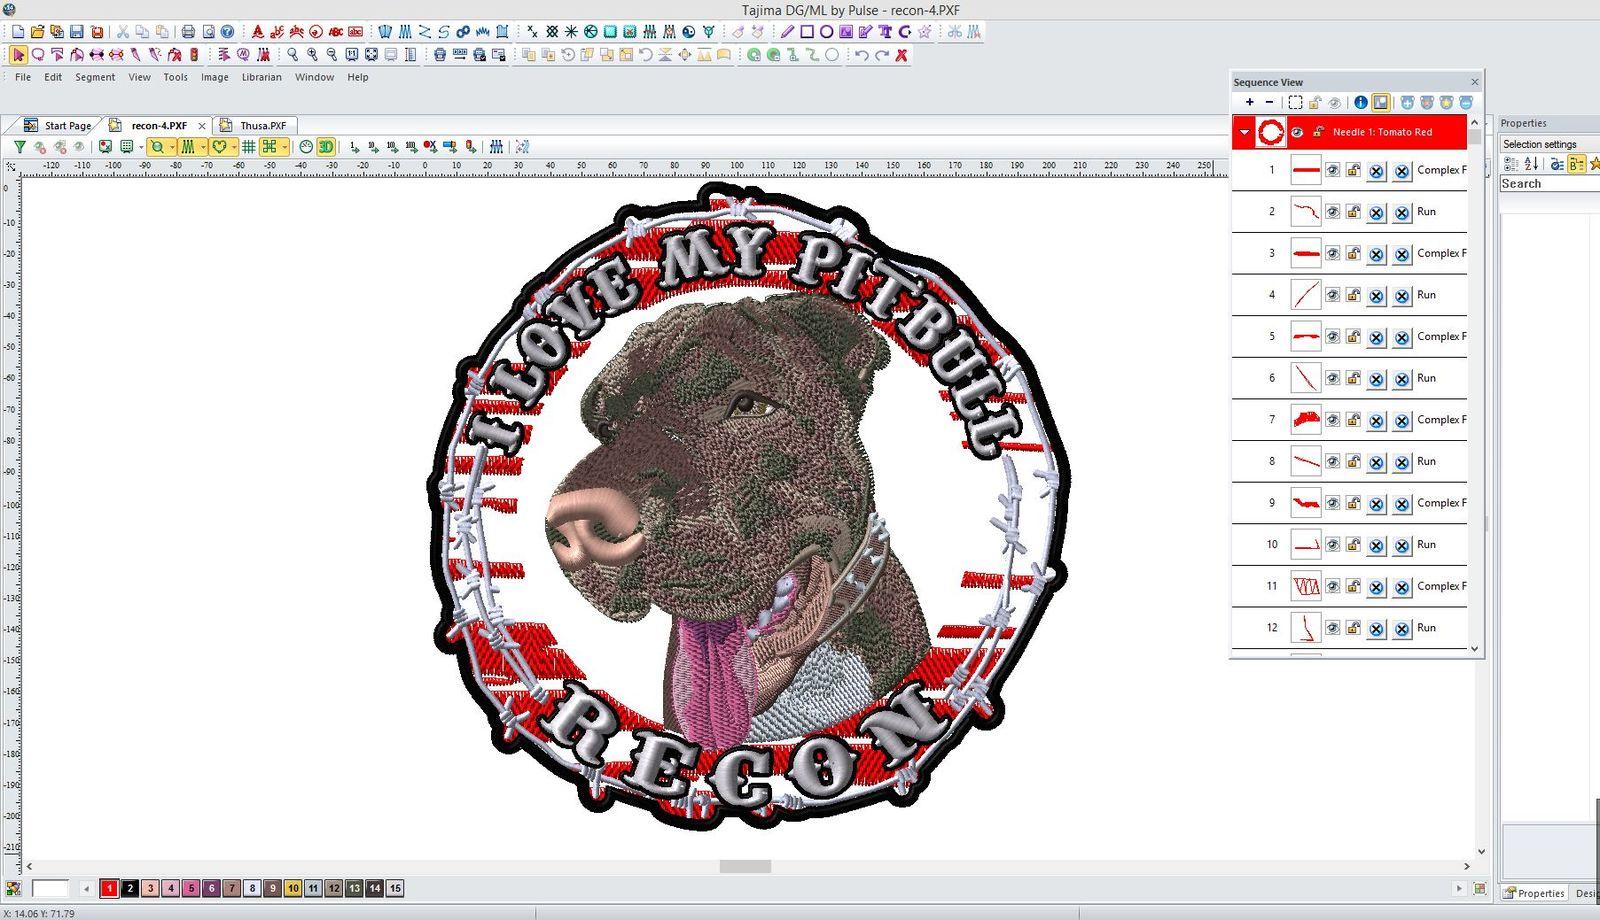 Pitbull dog head embroidery Tajima DG/ML by Pulse Screenshot